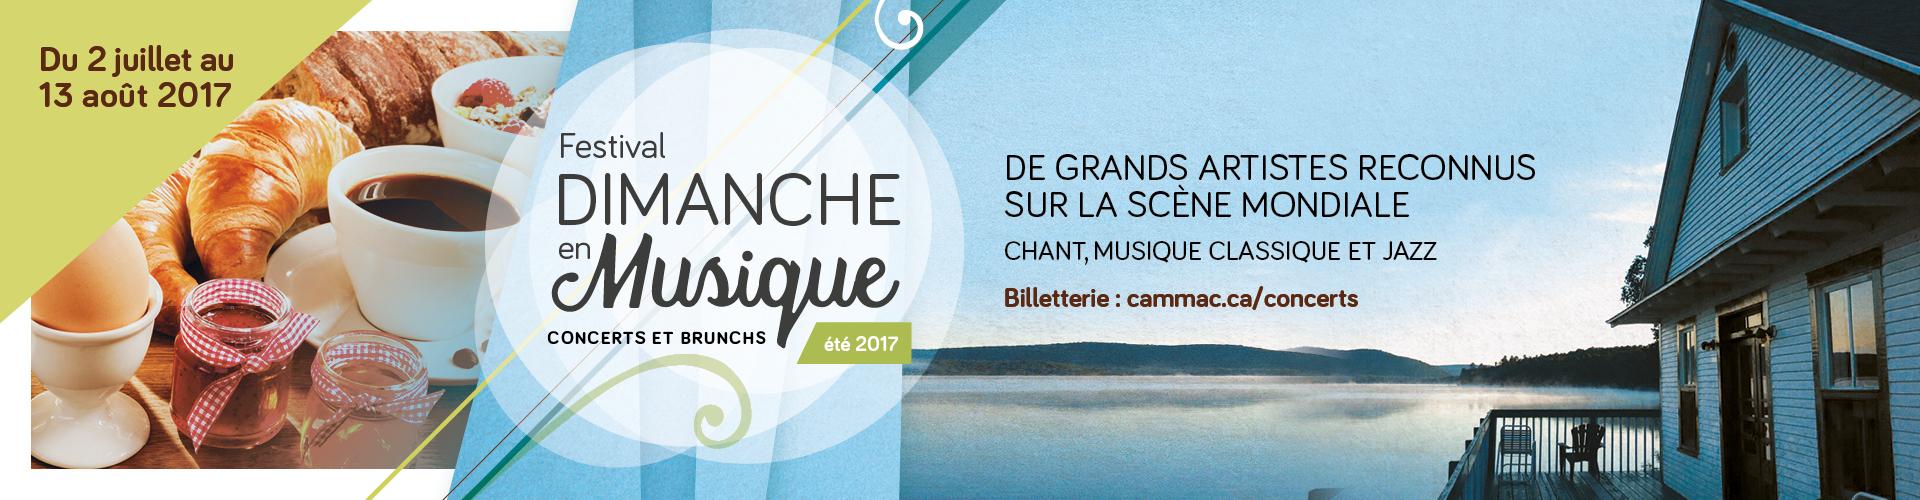 Concerts brunchs CAMMAC laurentides